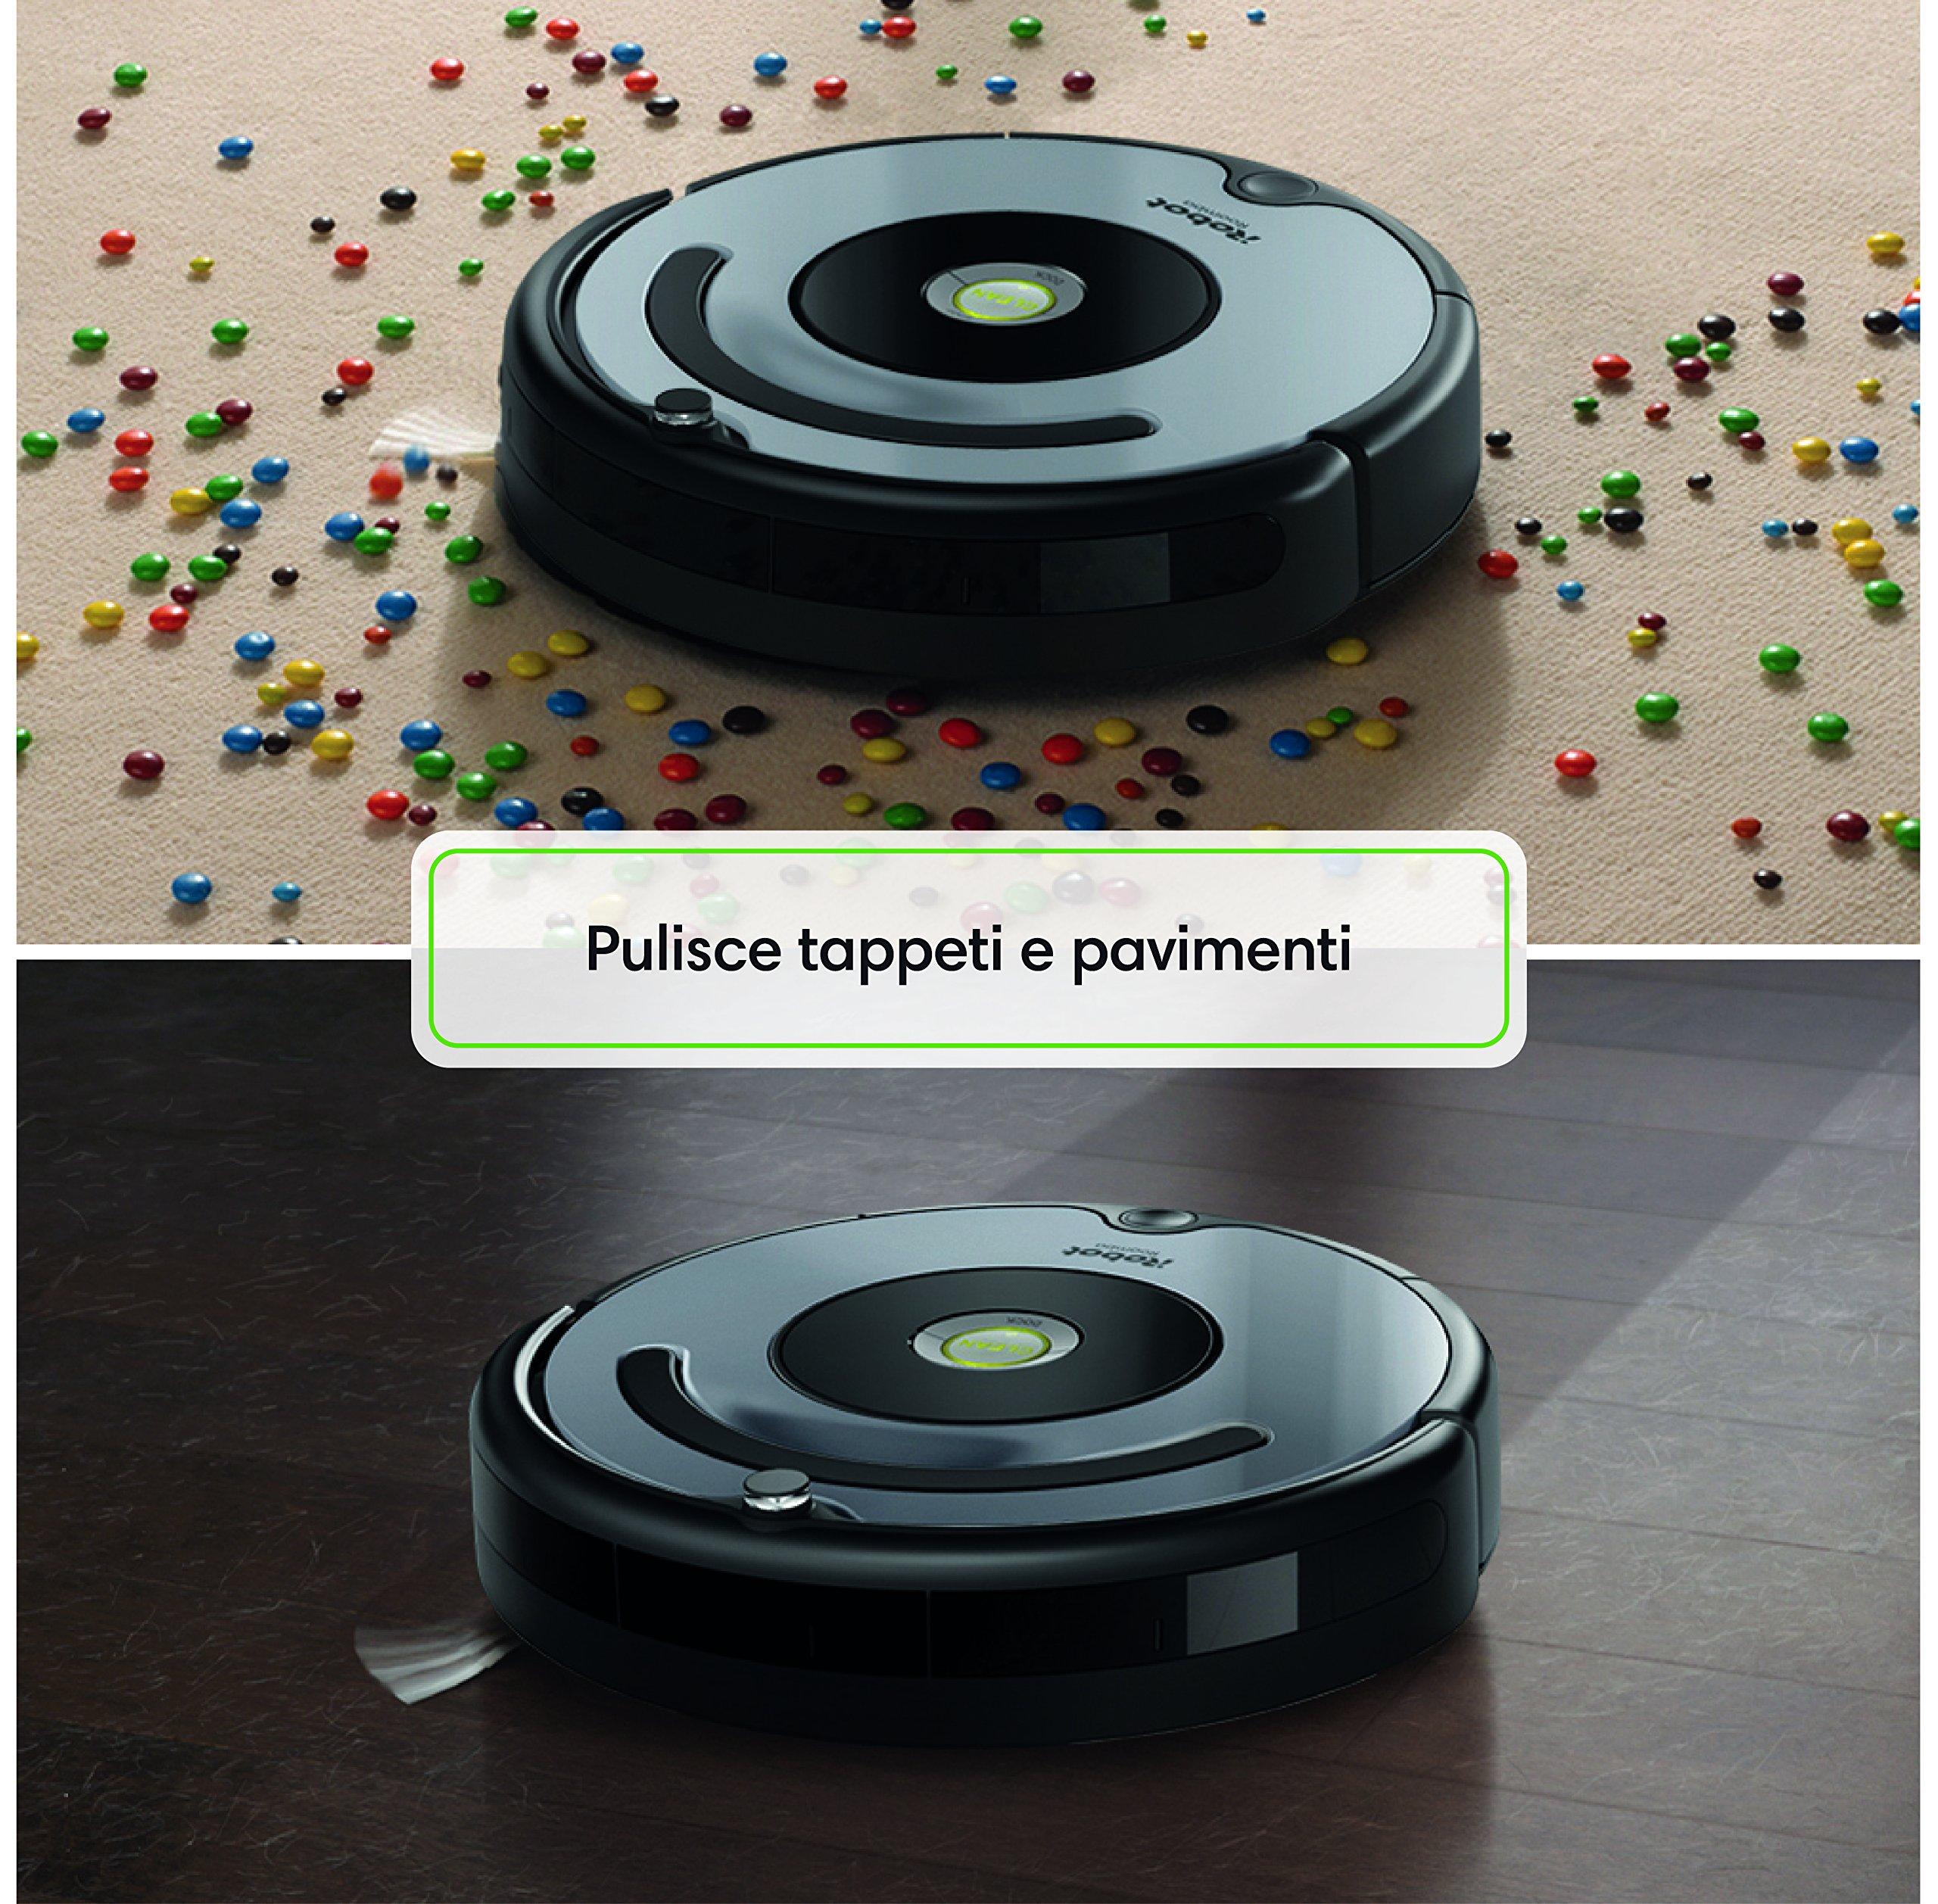 3 fasi iRobot Roomba 615 Robot Aspirapolvere casa Pavimenti,Tappeti,Dirt Detect